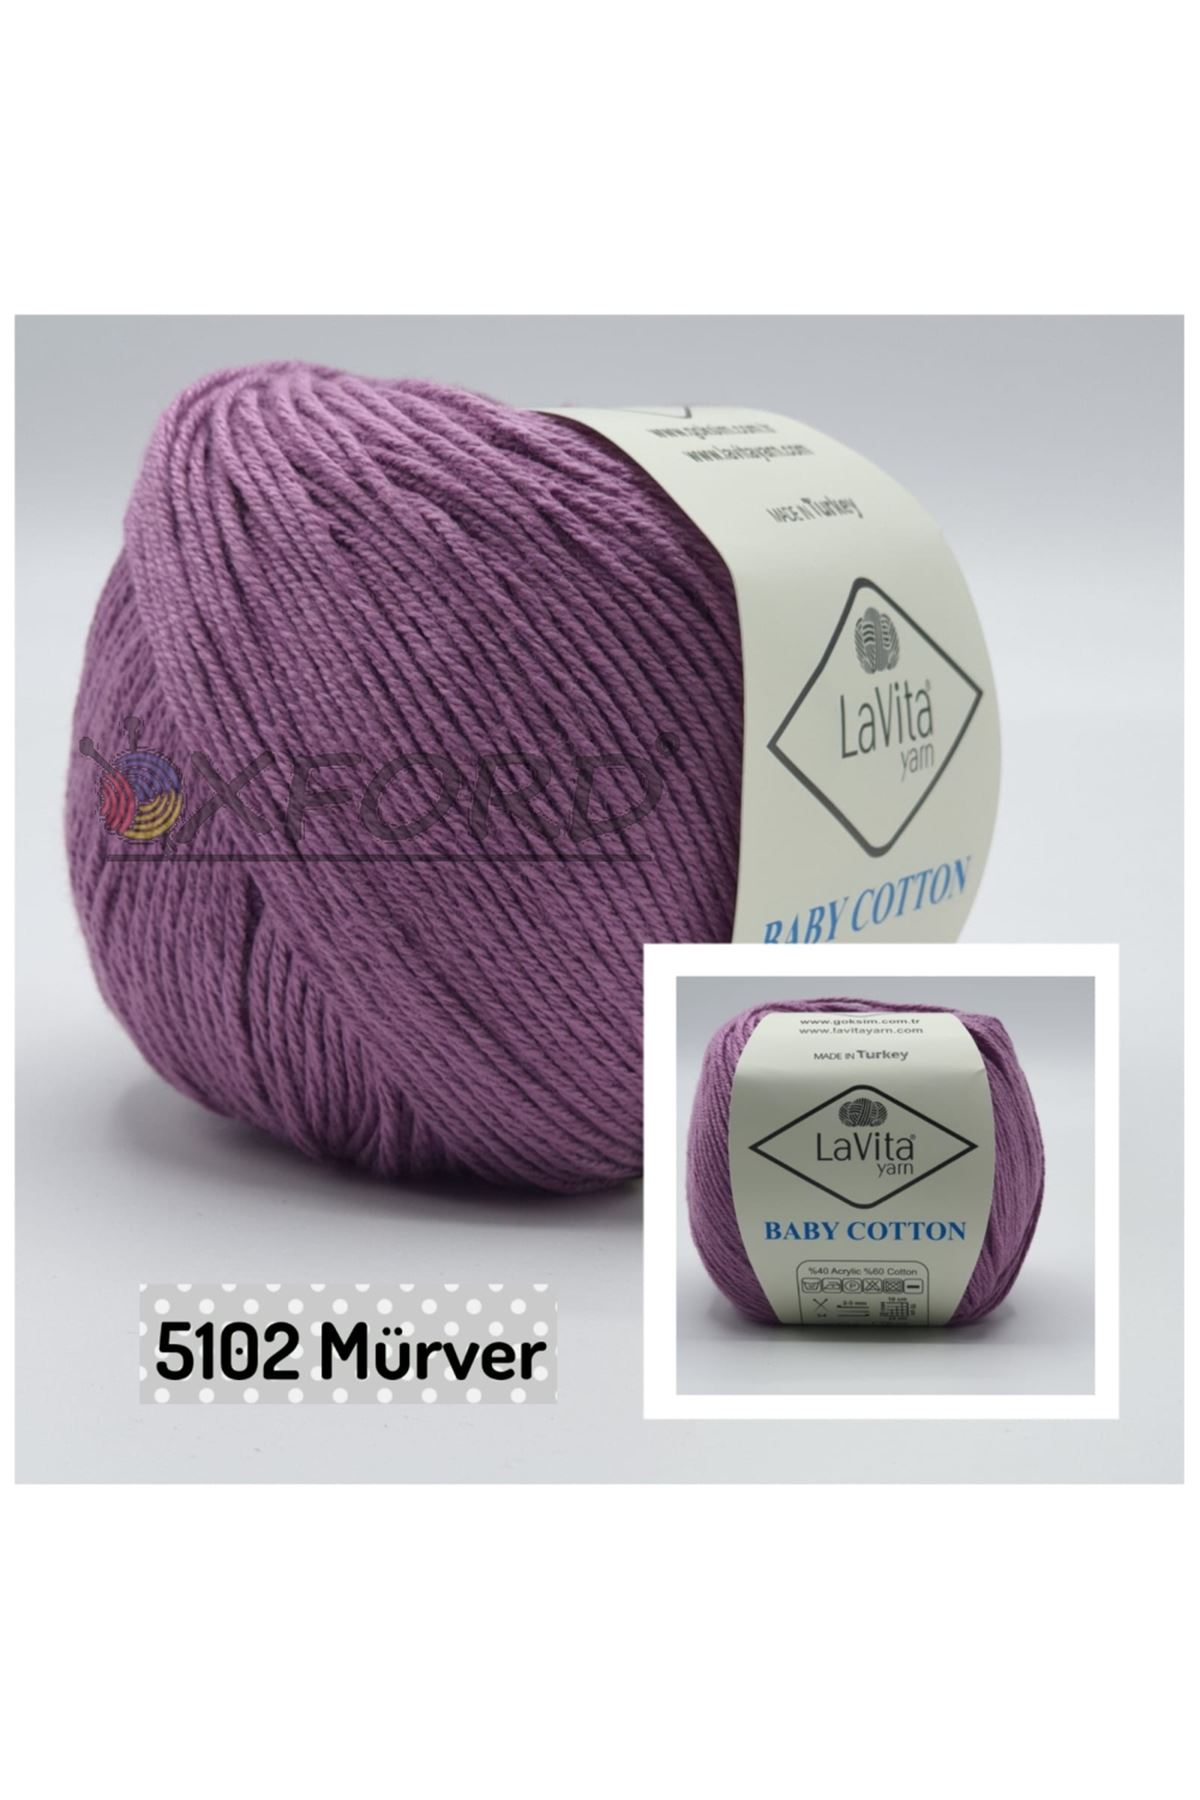 Lavita Baby Cotton 5102 Mürver